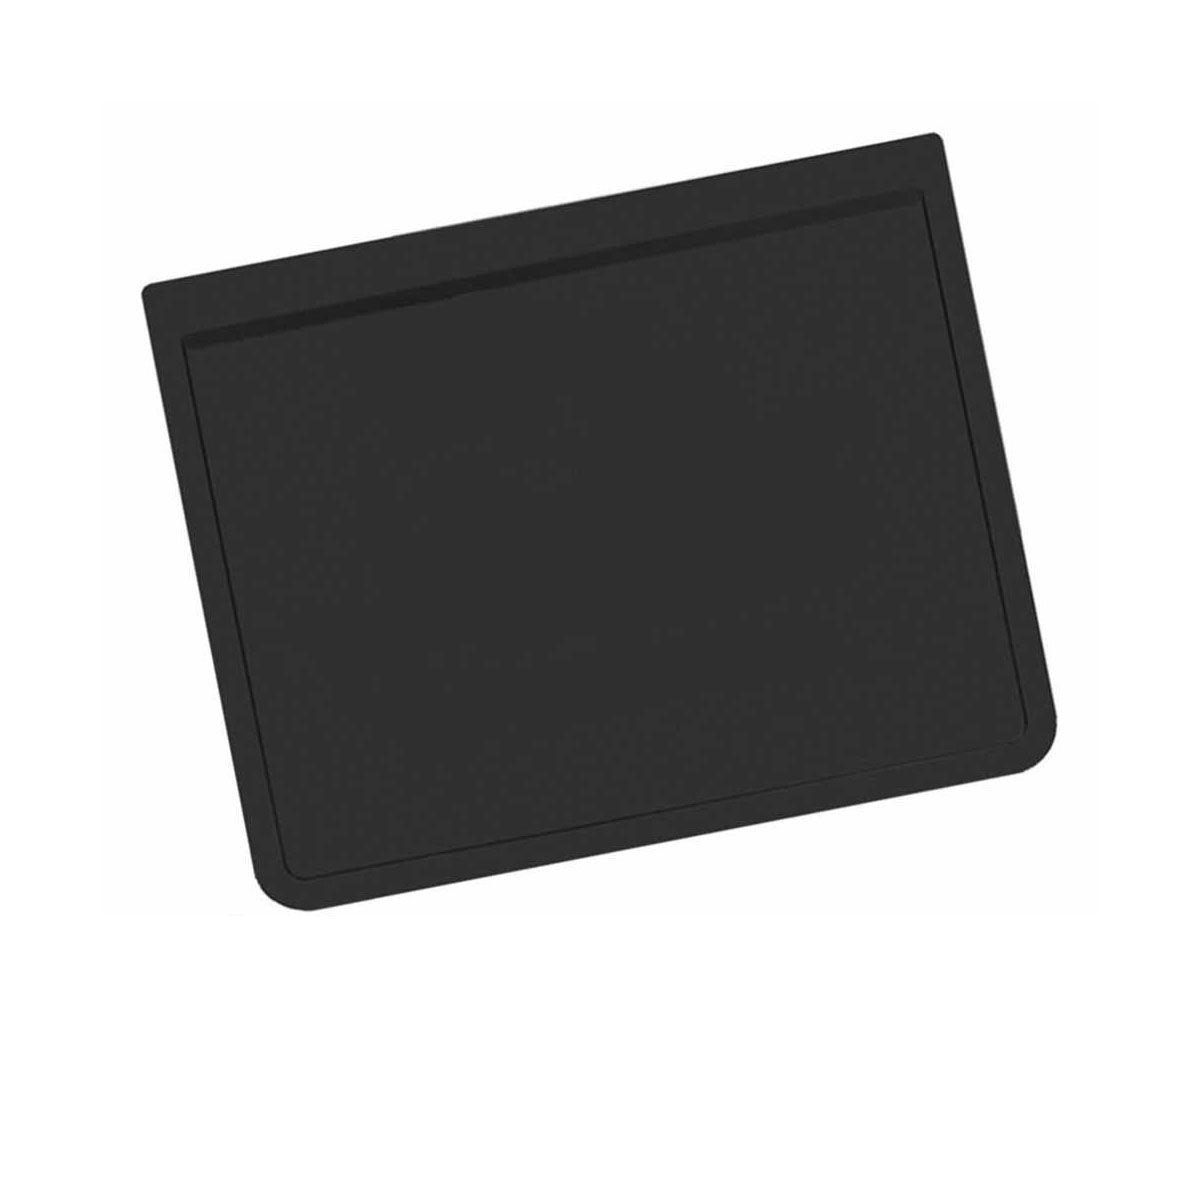 Apara Barro Injetado Liso (57,5x62)